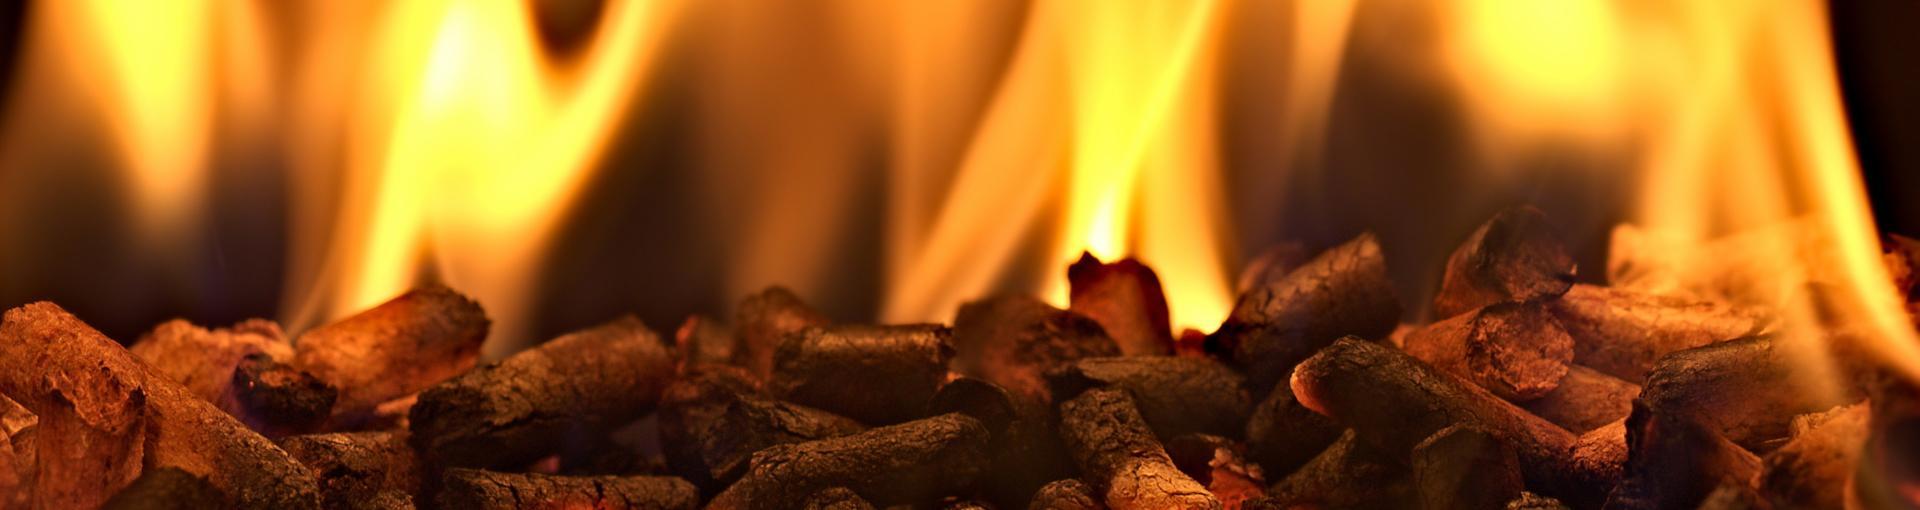 Pellets qui brûlent